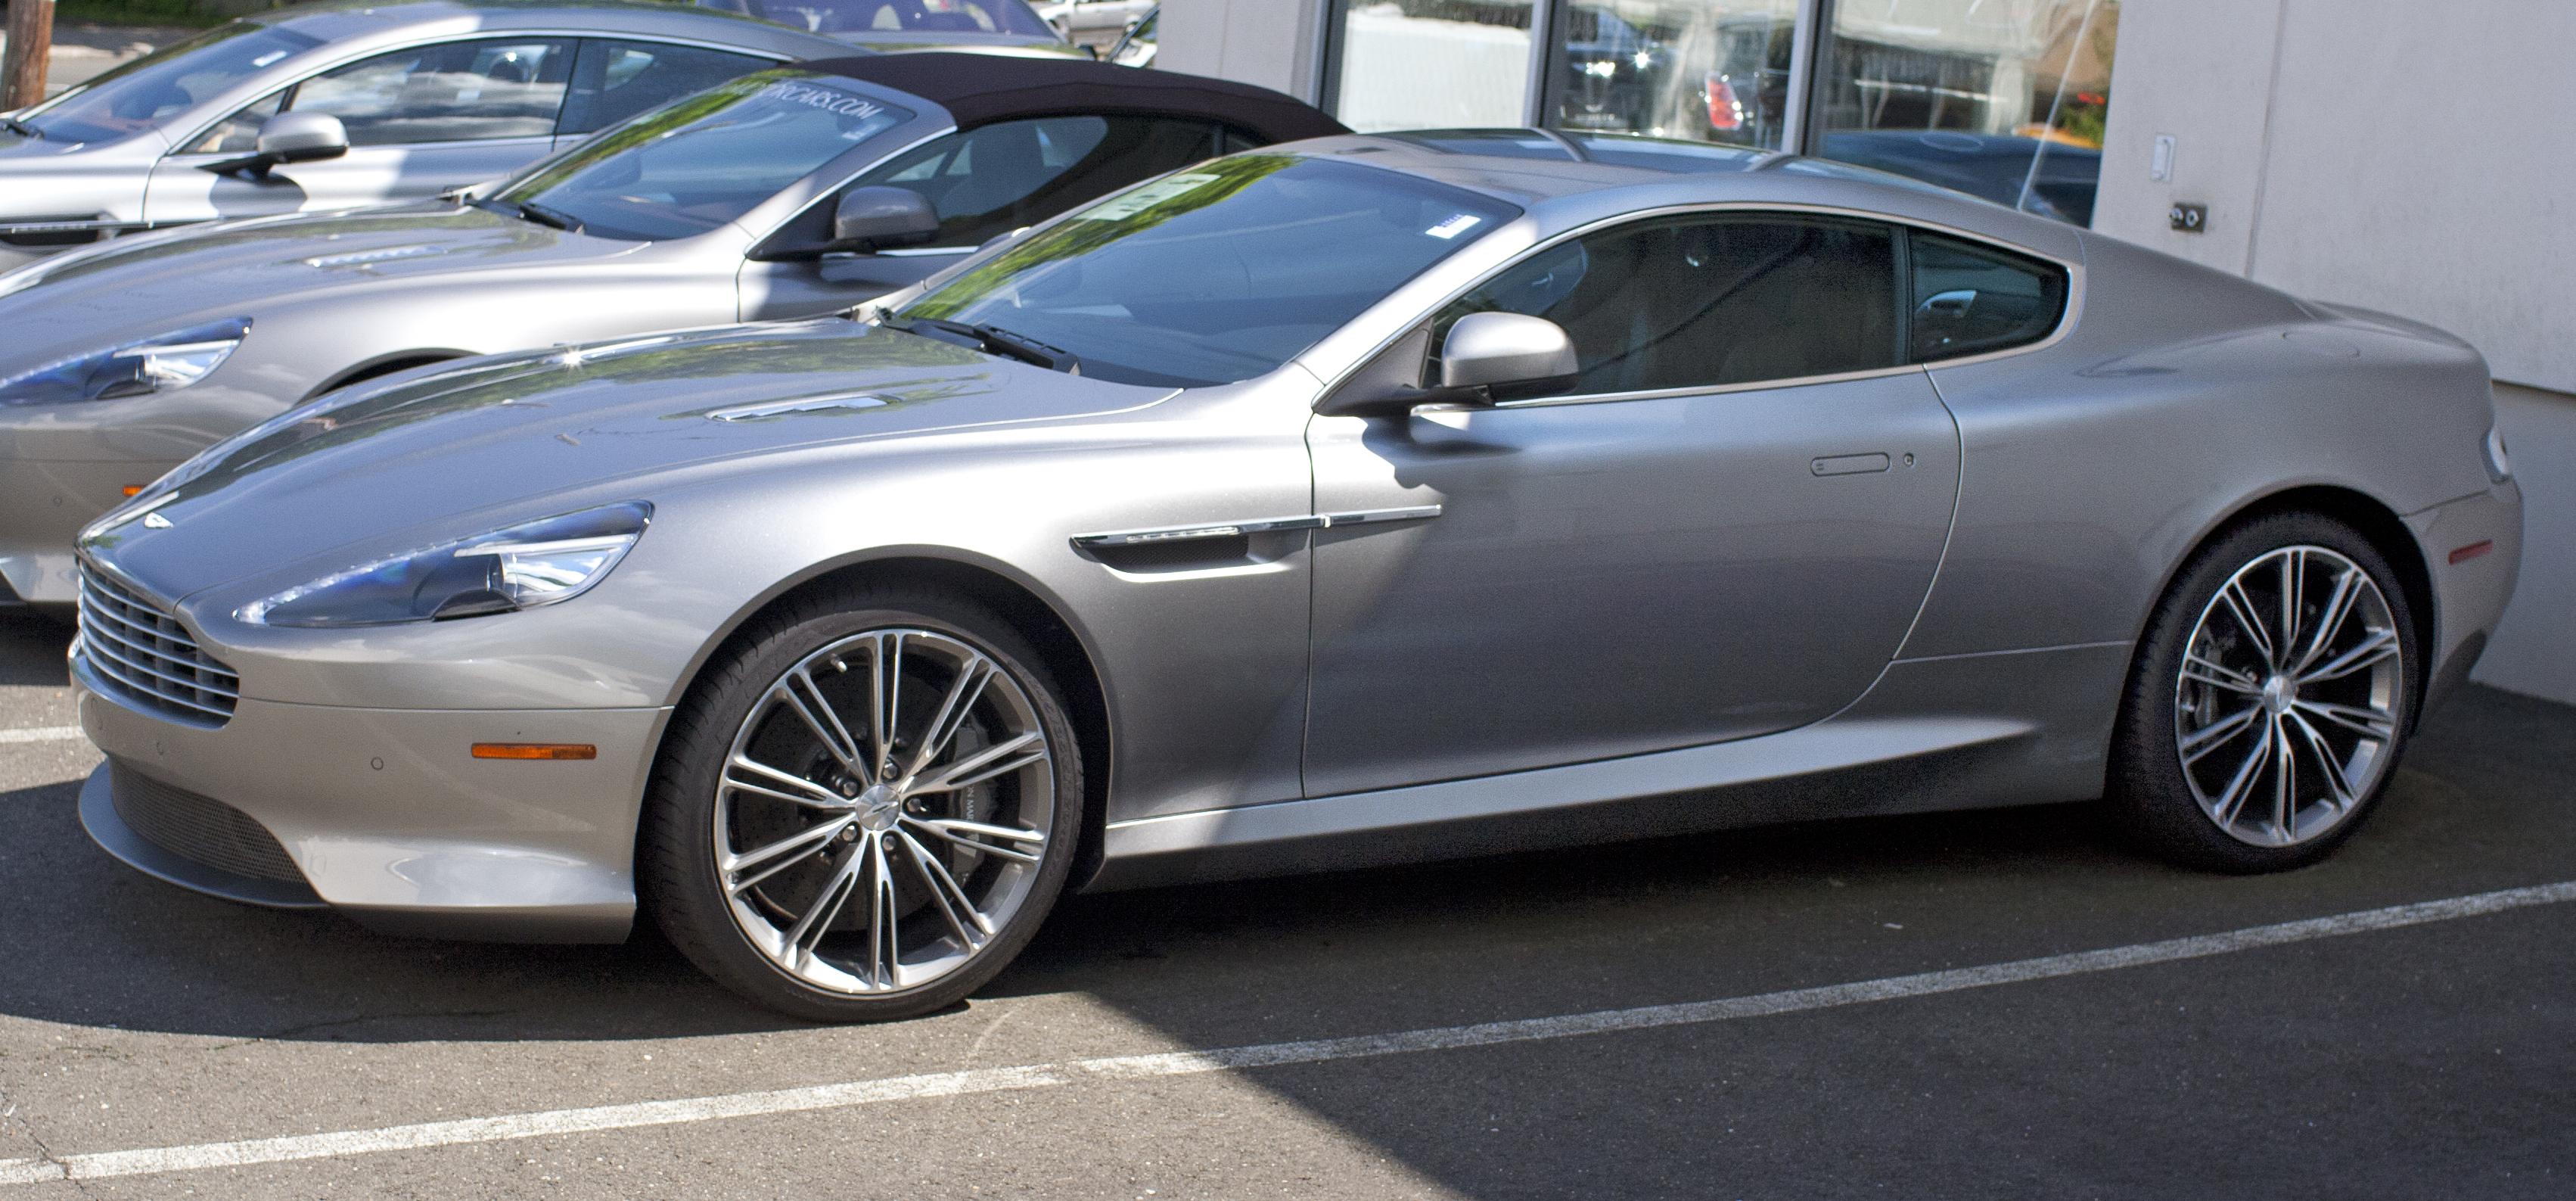 Aston Martin Virage II 2011 - 2012 Coupe #1